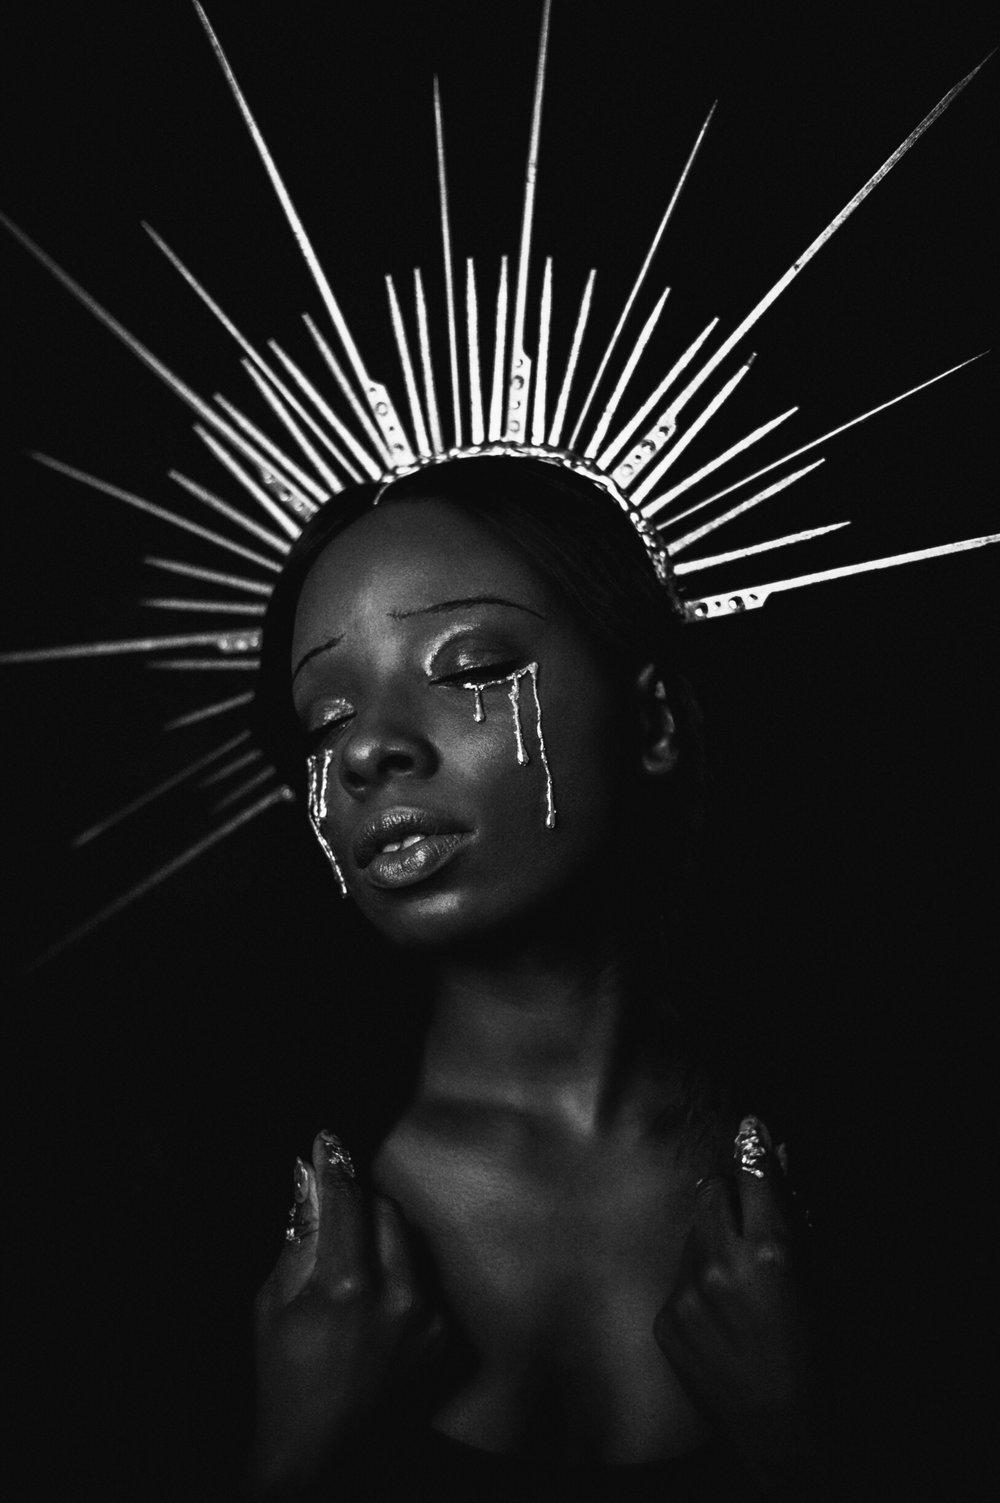 TheGlossier-TashaJames-Halloween-2018-Crying-Saint-Gold-Heavenly-Bodies14.JPG